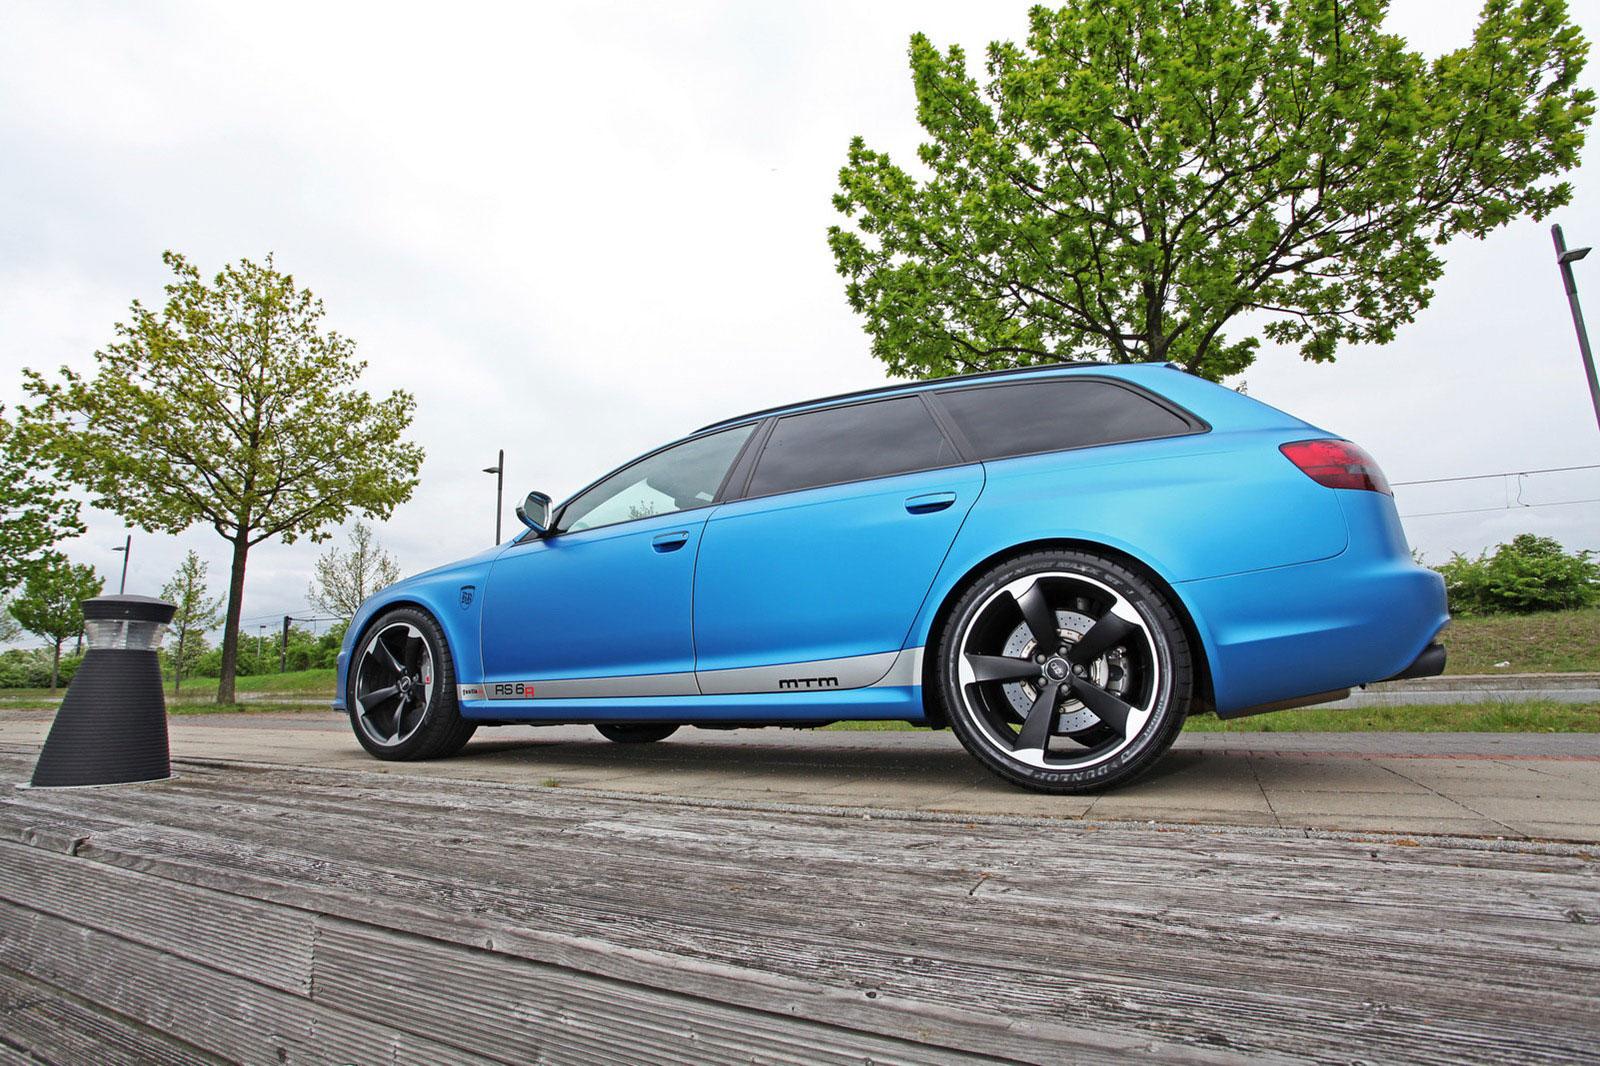 Fostla a MTM vytvořili velmi našlapané Audi RS6 Avant 8